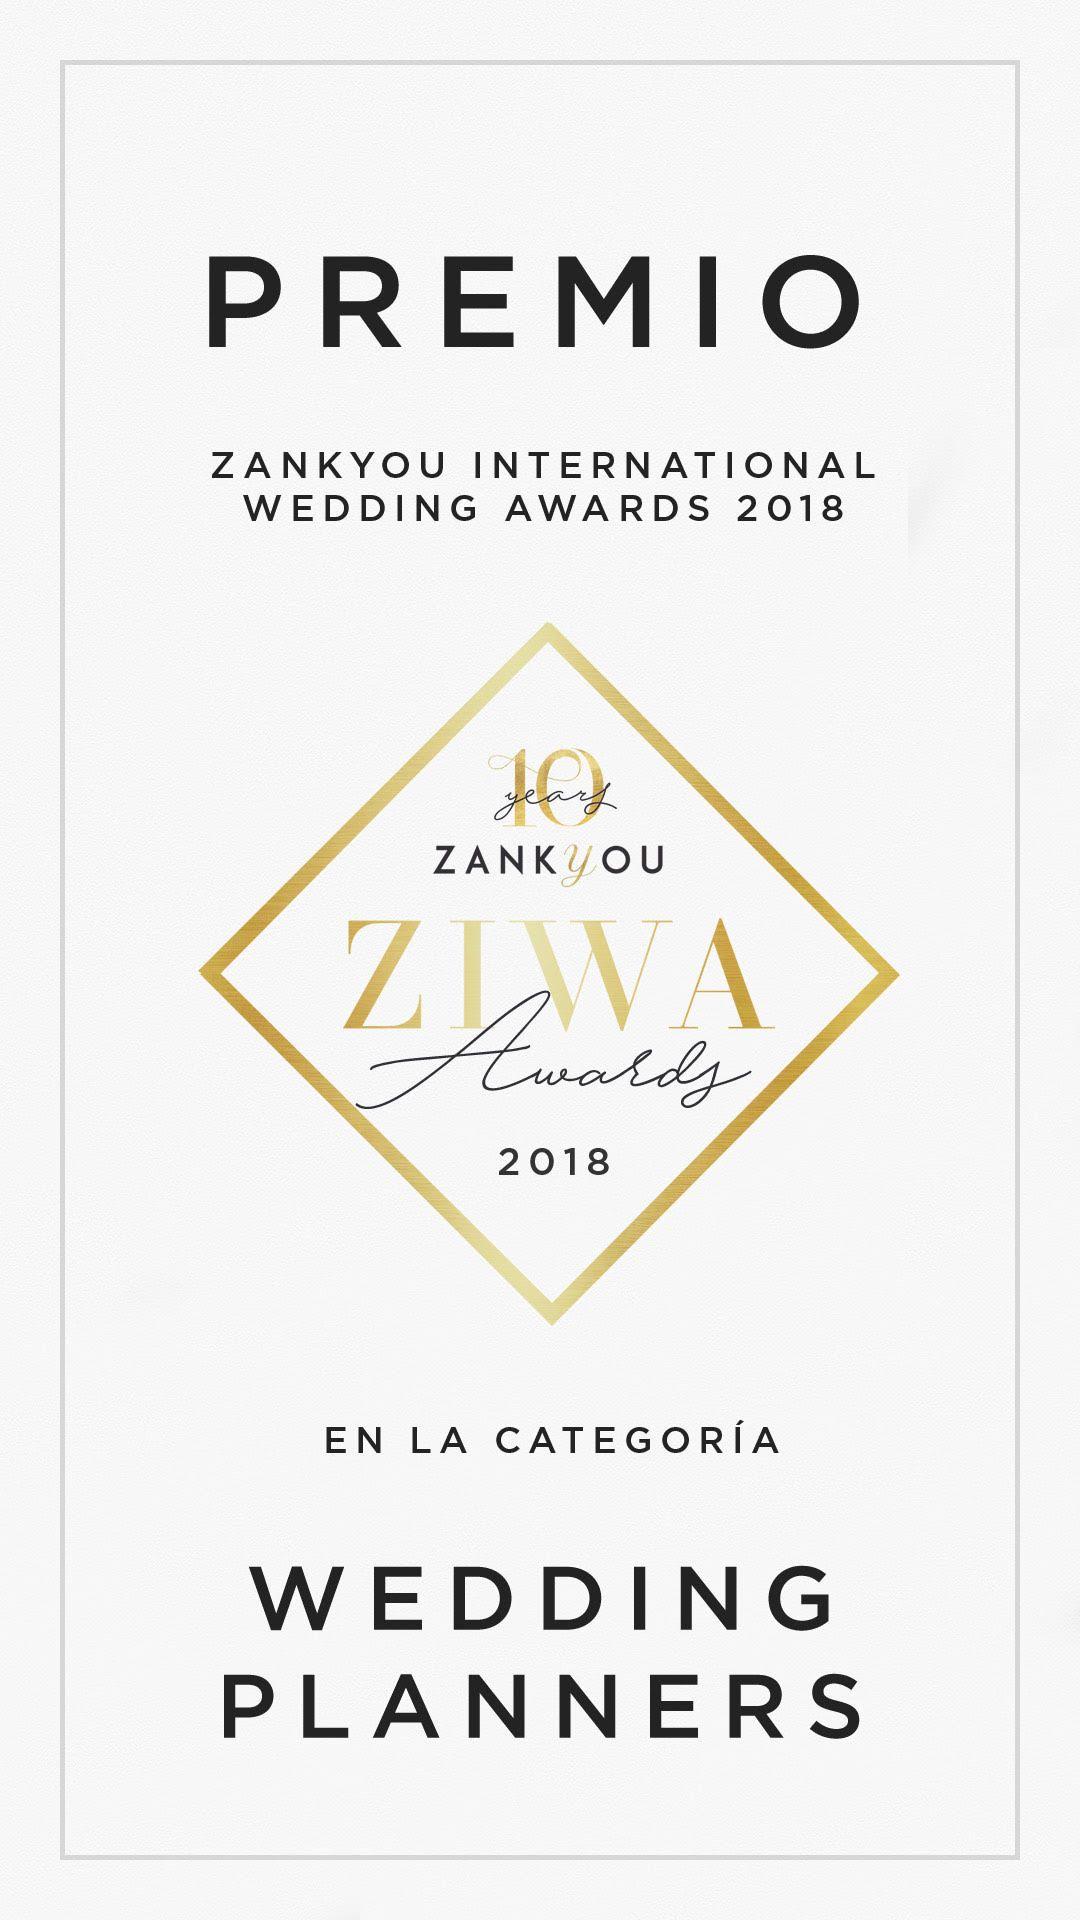 Foto de Zankyou International Wedding Awards de 2018